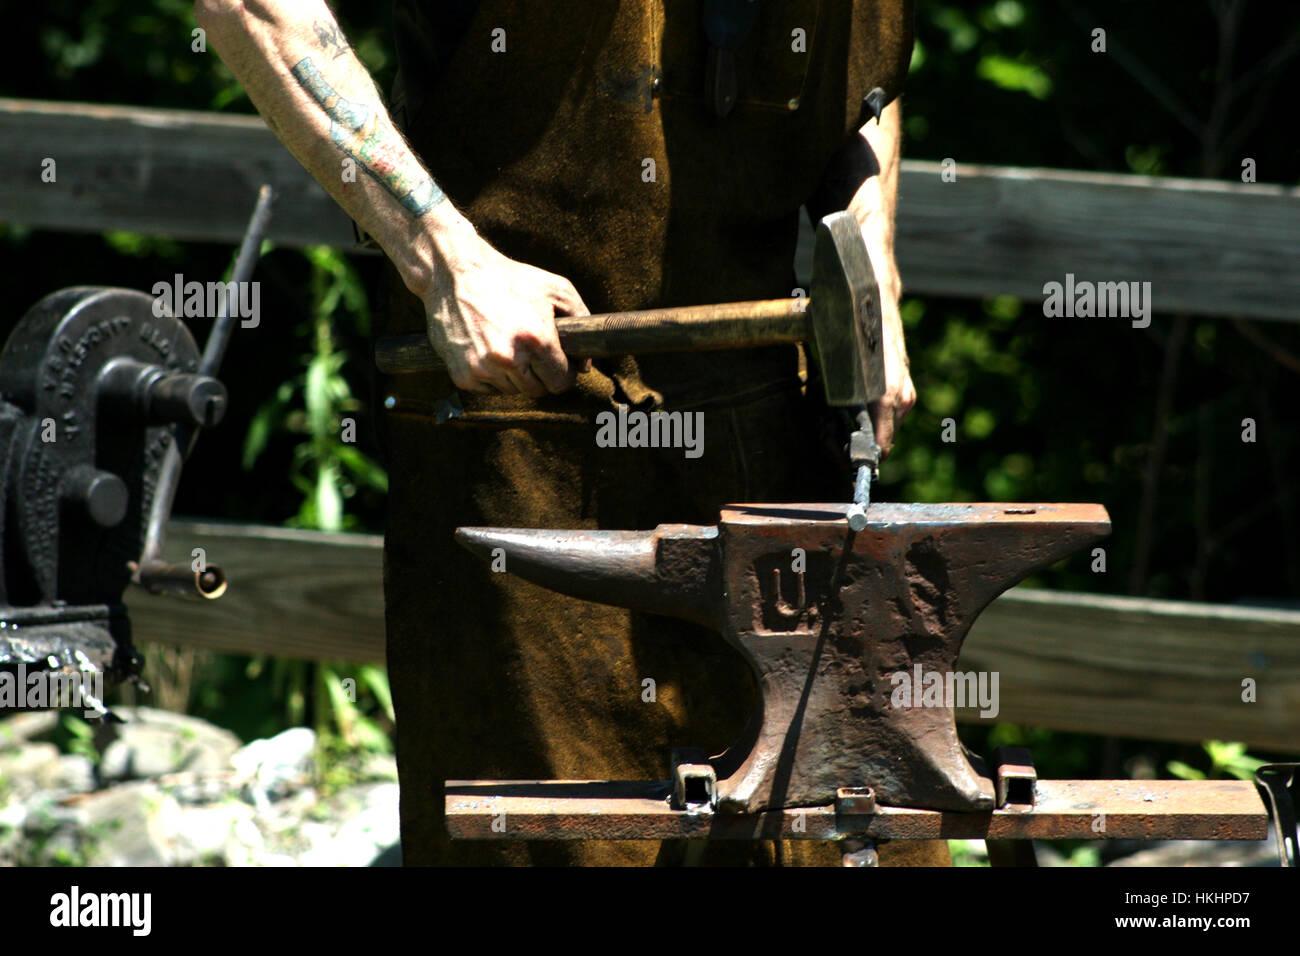 Blacksmith manually forging the molten metal on the anvil Stock